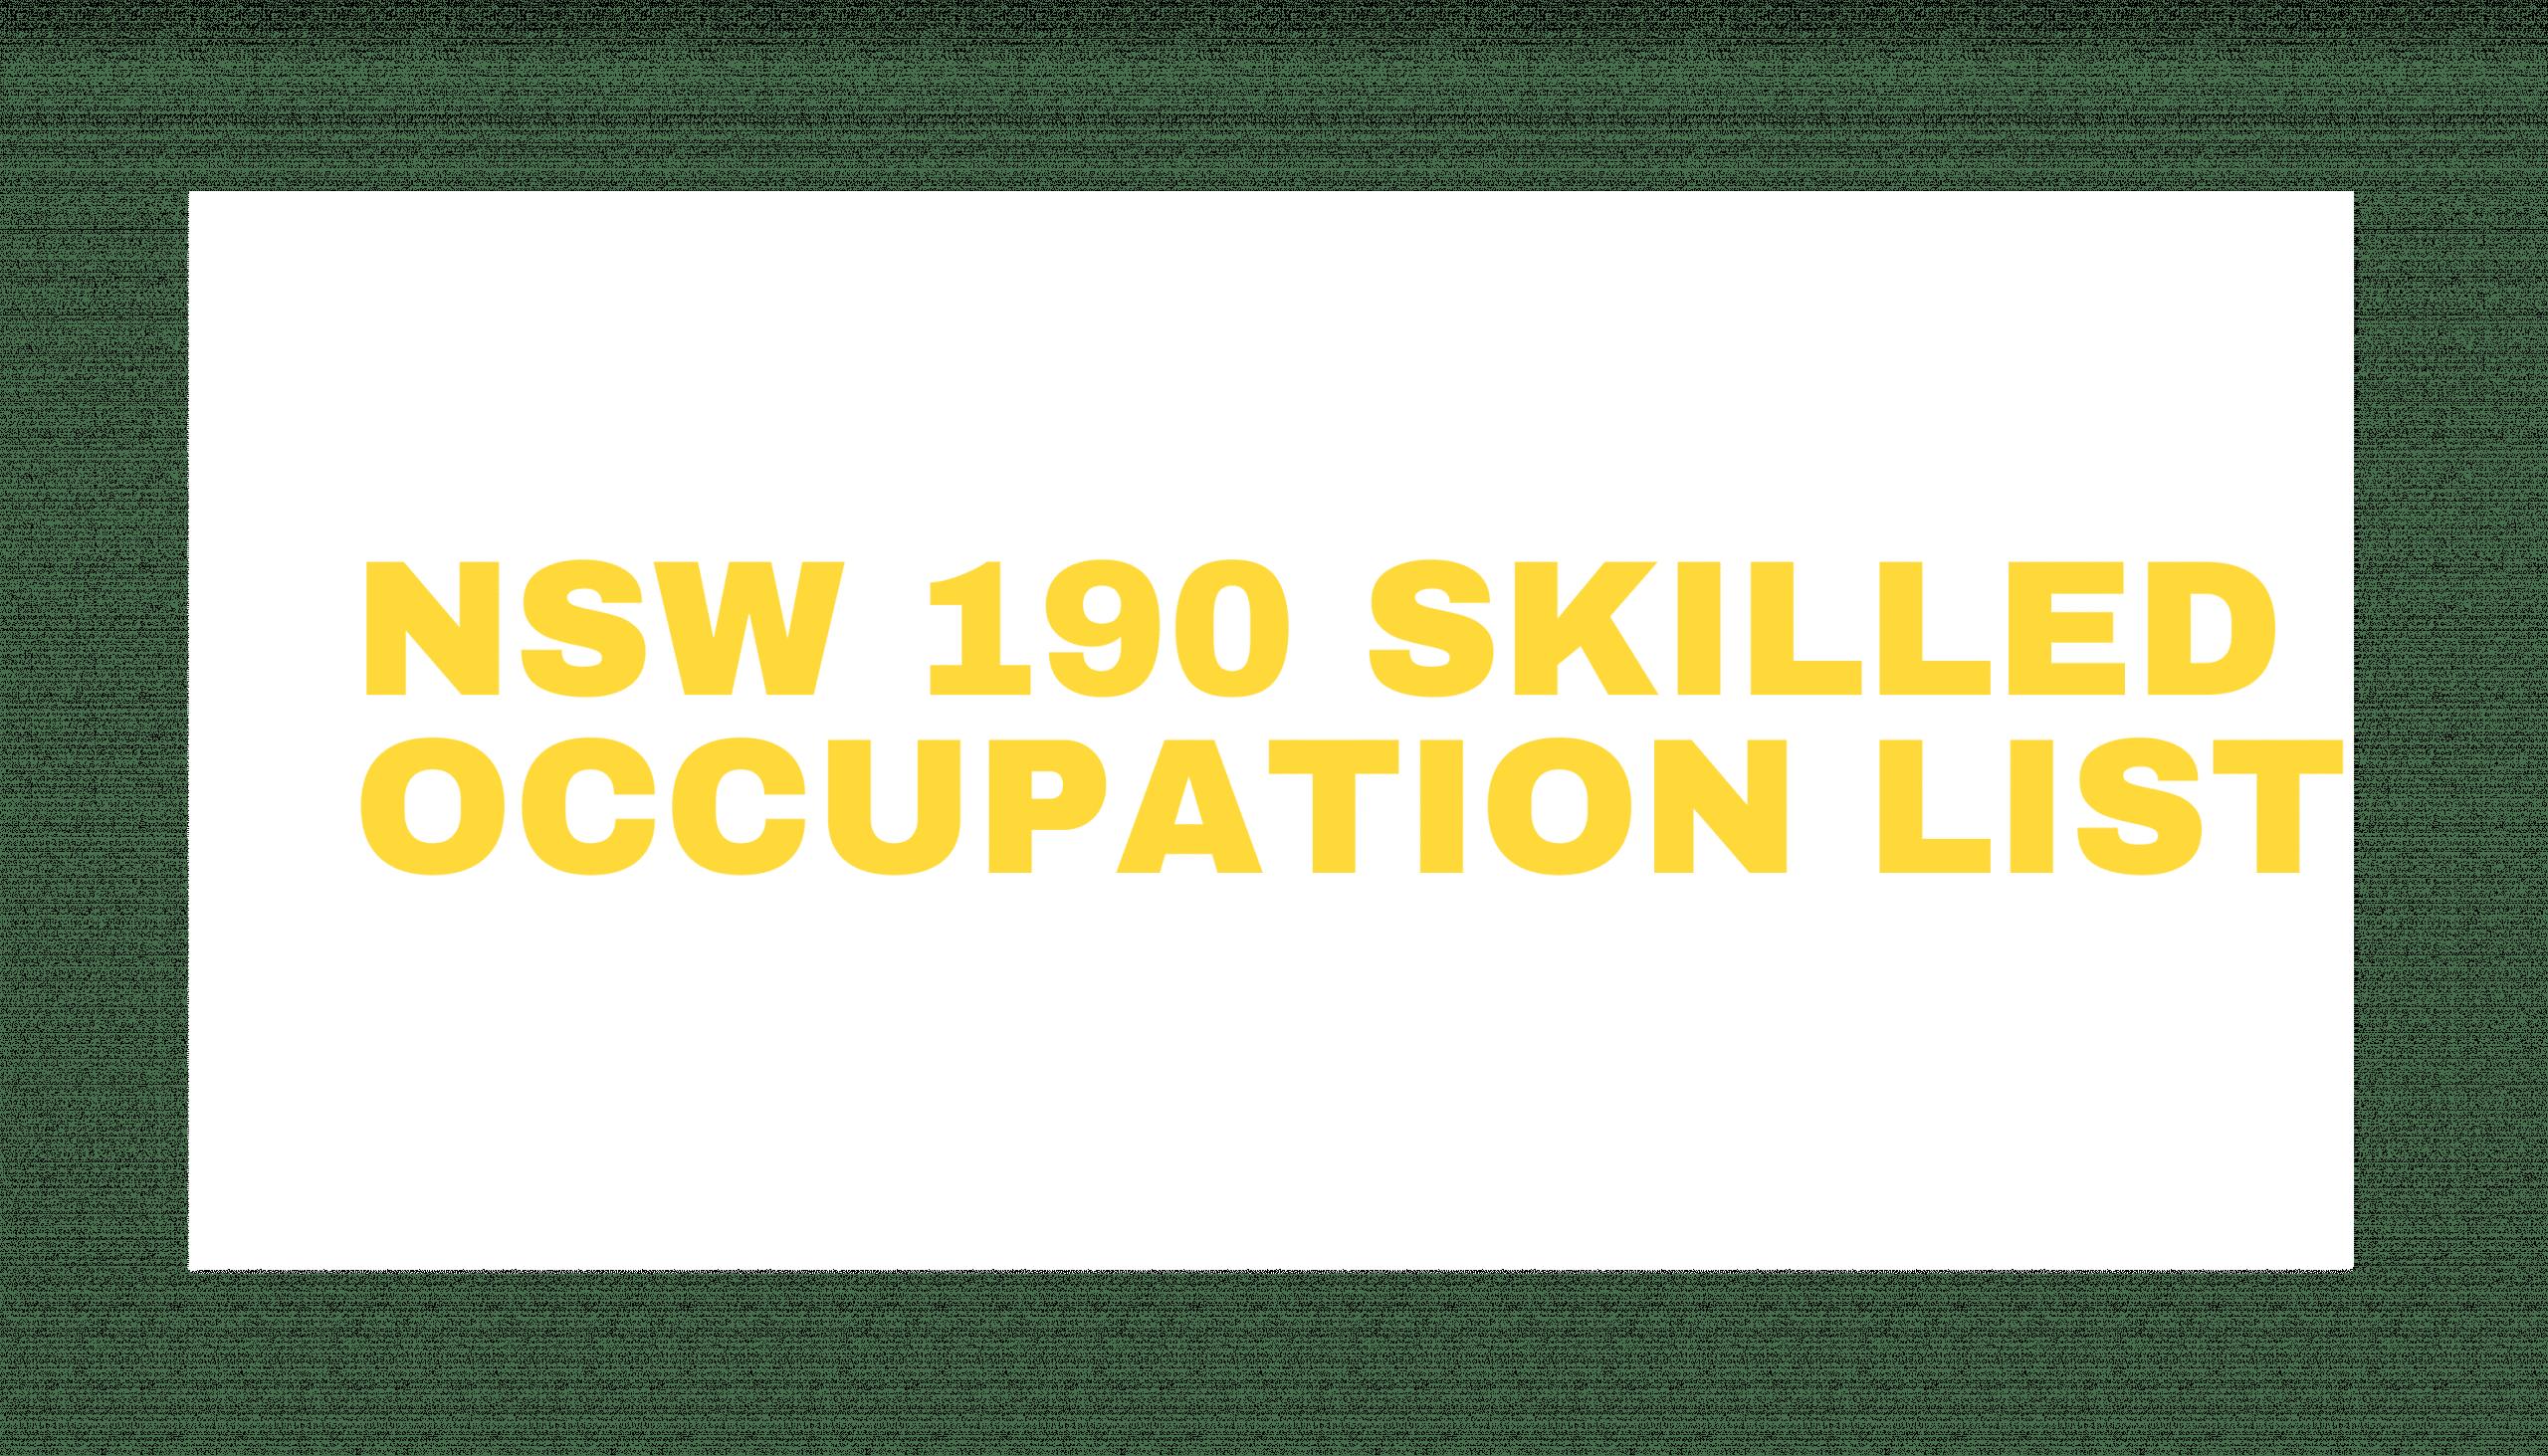 NSW 190 Skilled Occupation List 2021